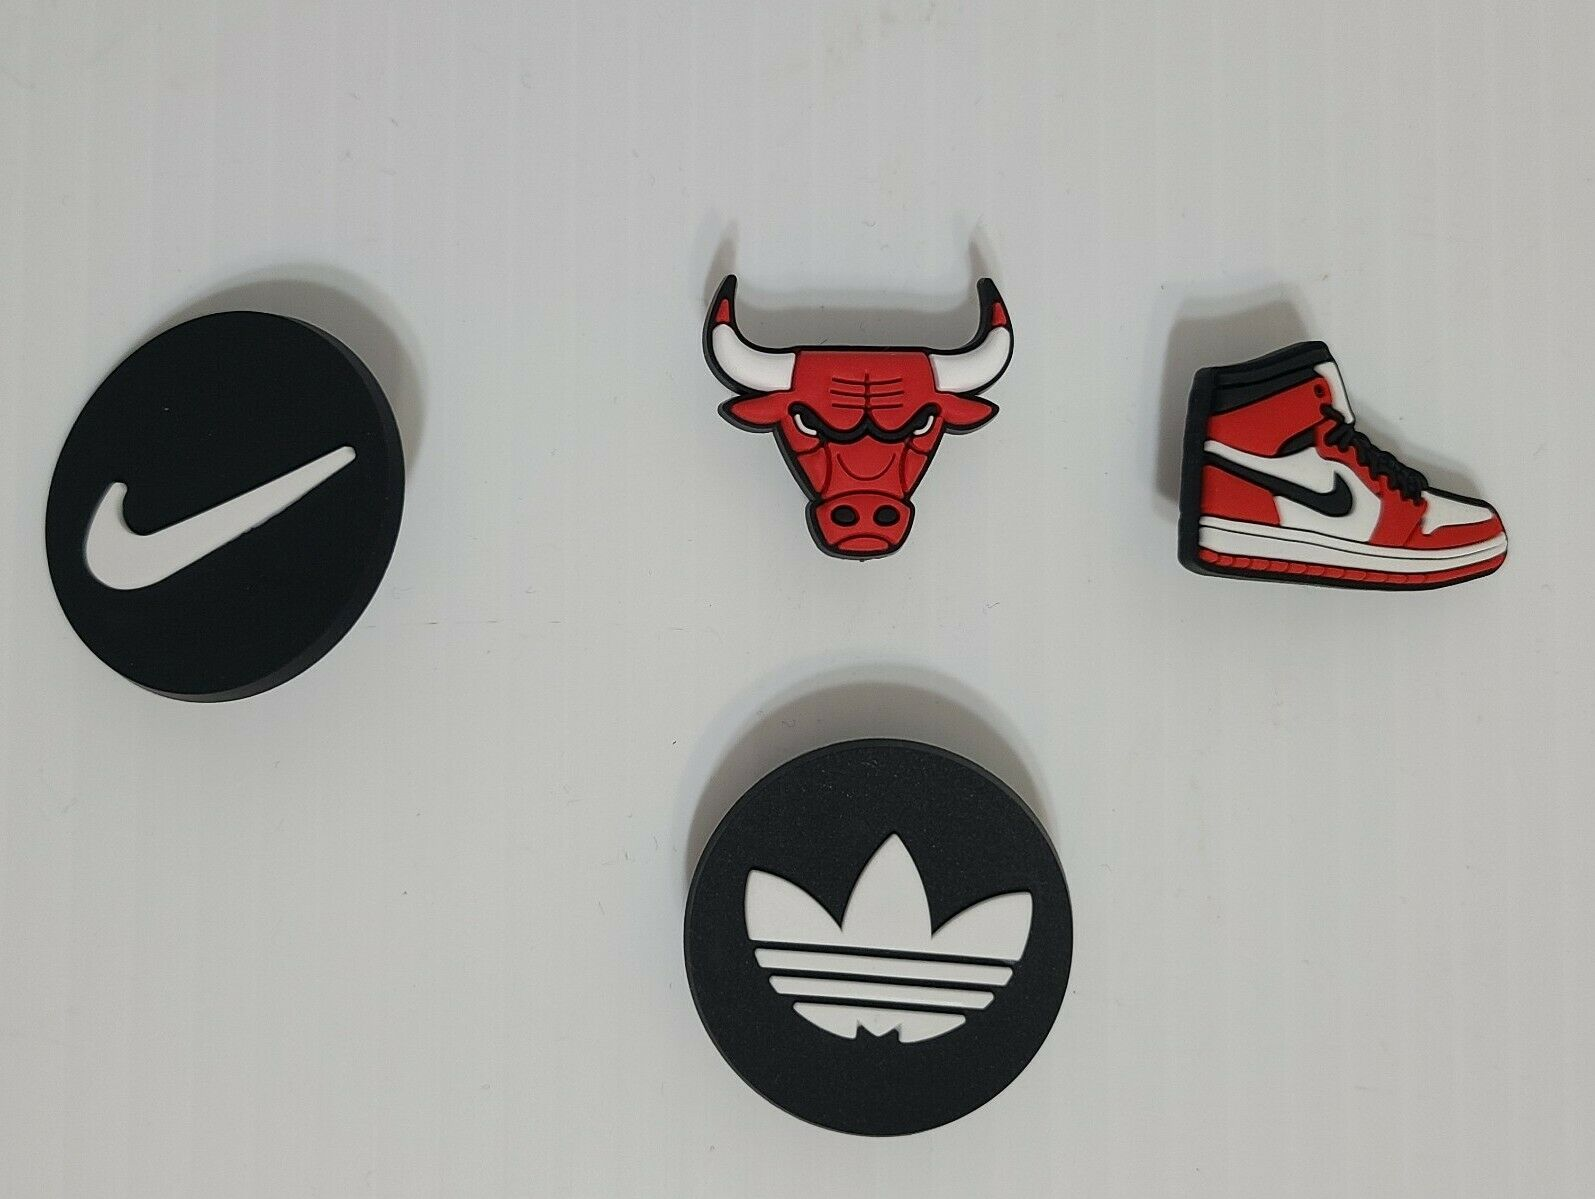 Chicago bulls nike adidas tenis shoes red mamba Shoe Charms Crocs 4 pcs soccer